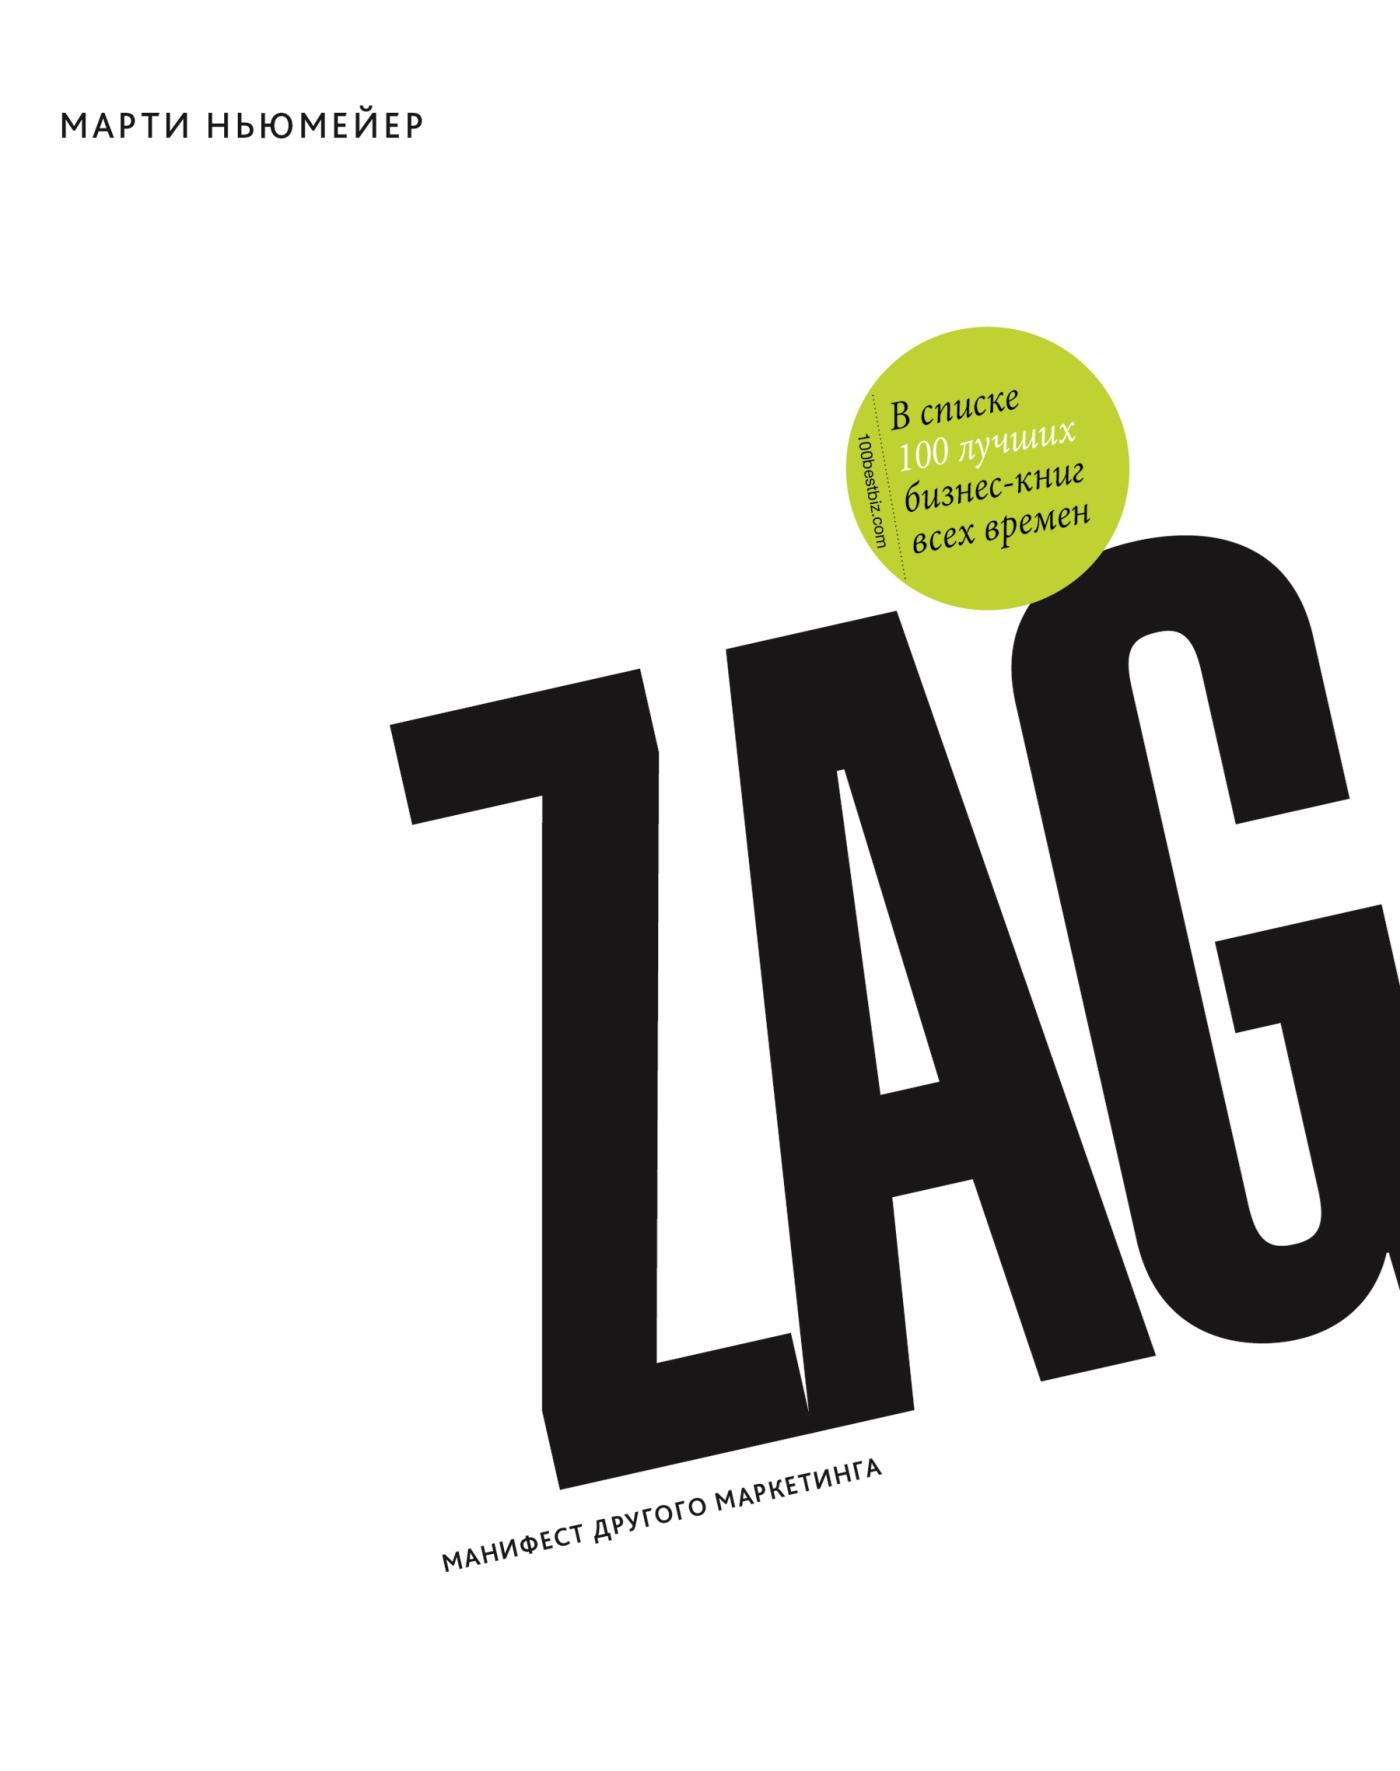 Марти Ньюмейер Zag: манифест другого маркетинга тарифный план